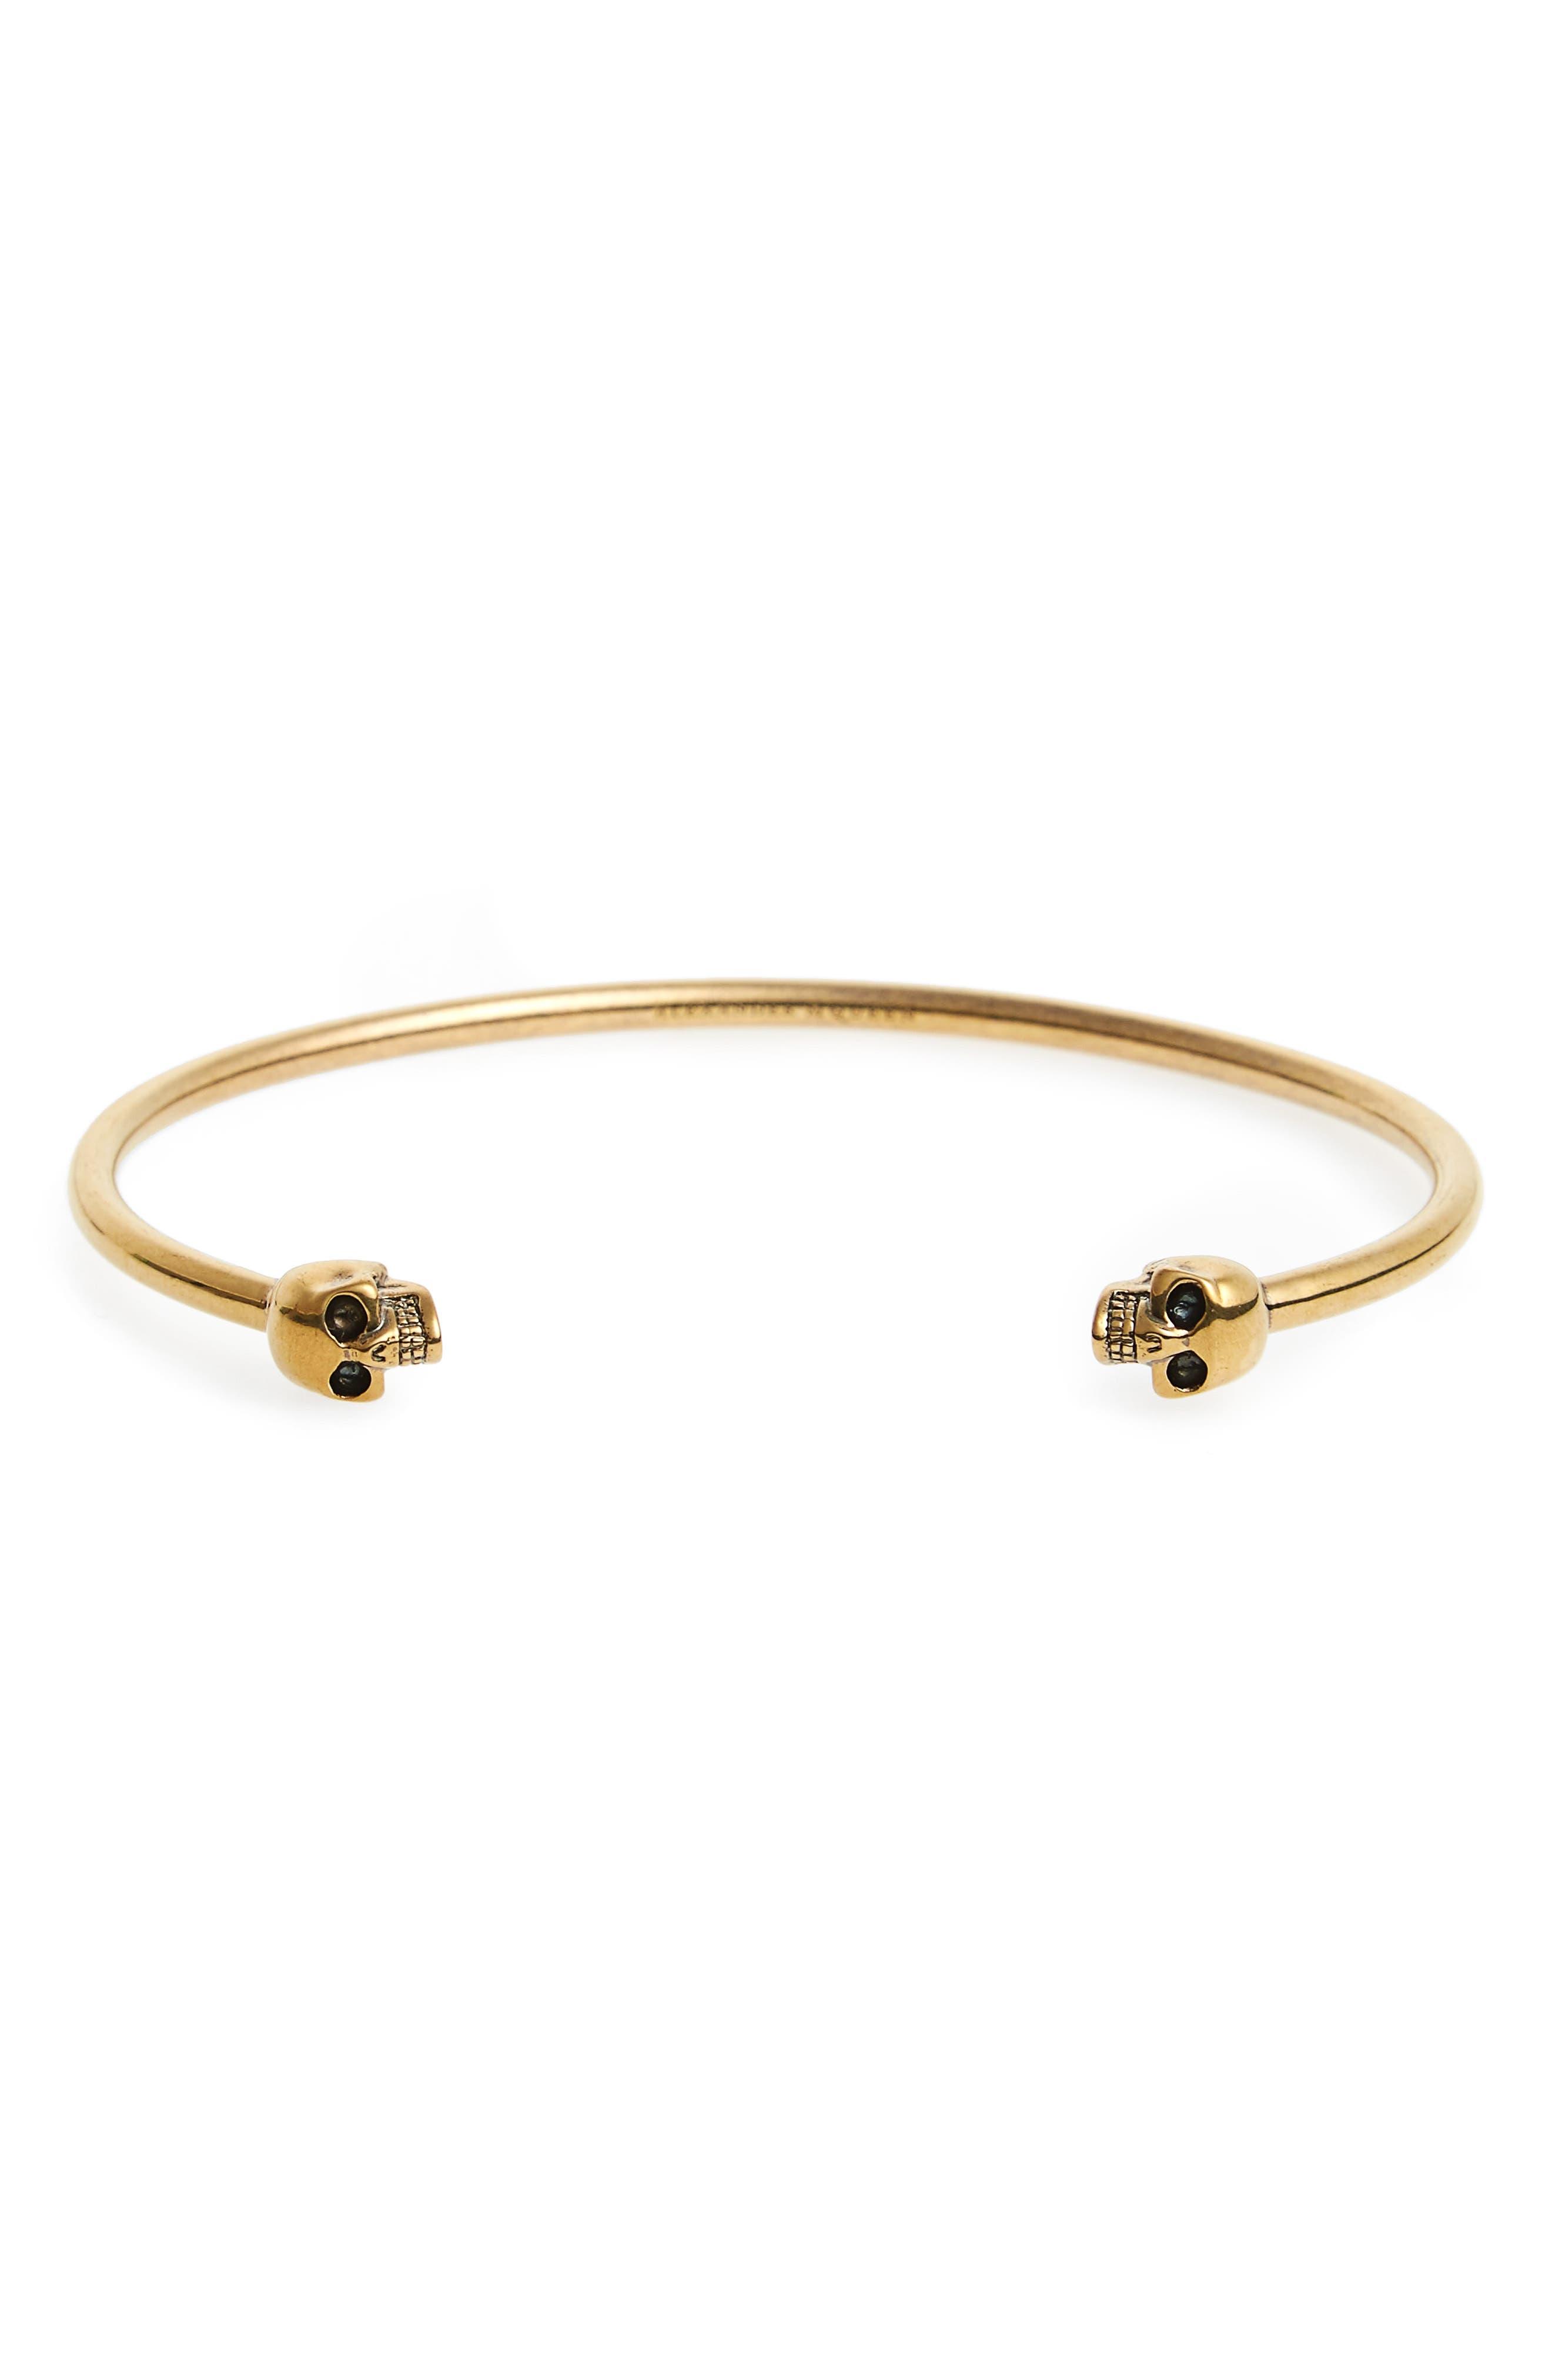 Twin Skull Cuff Bracelet,                         Main,                         color,